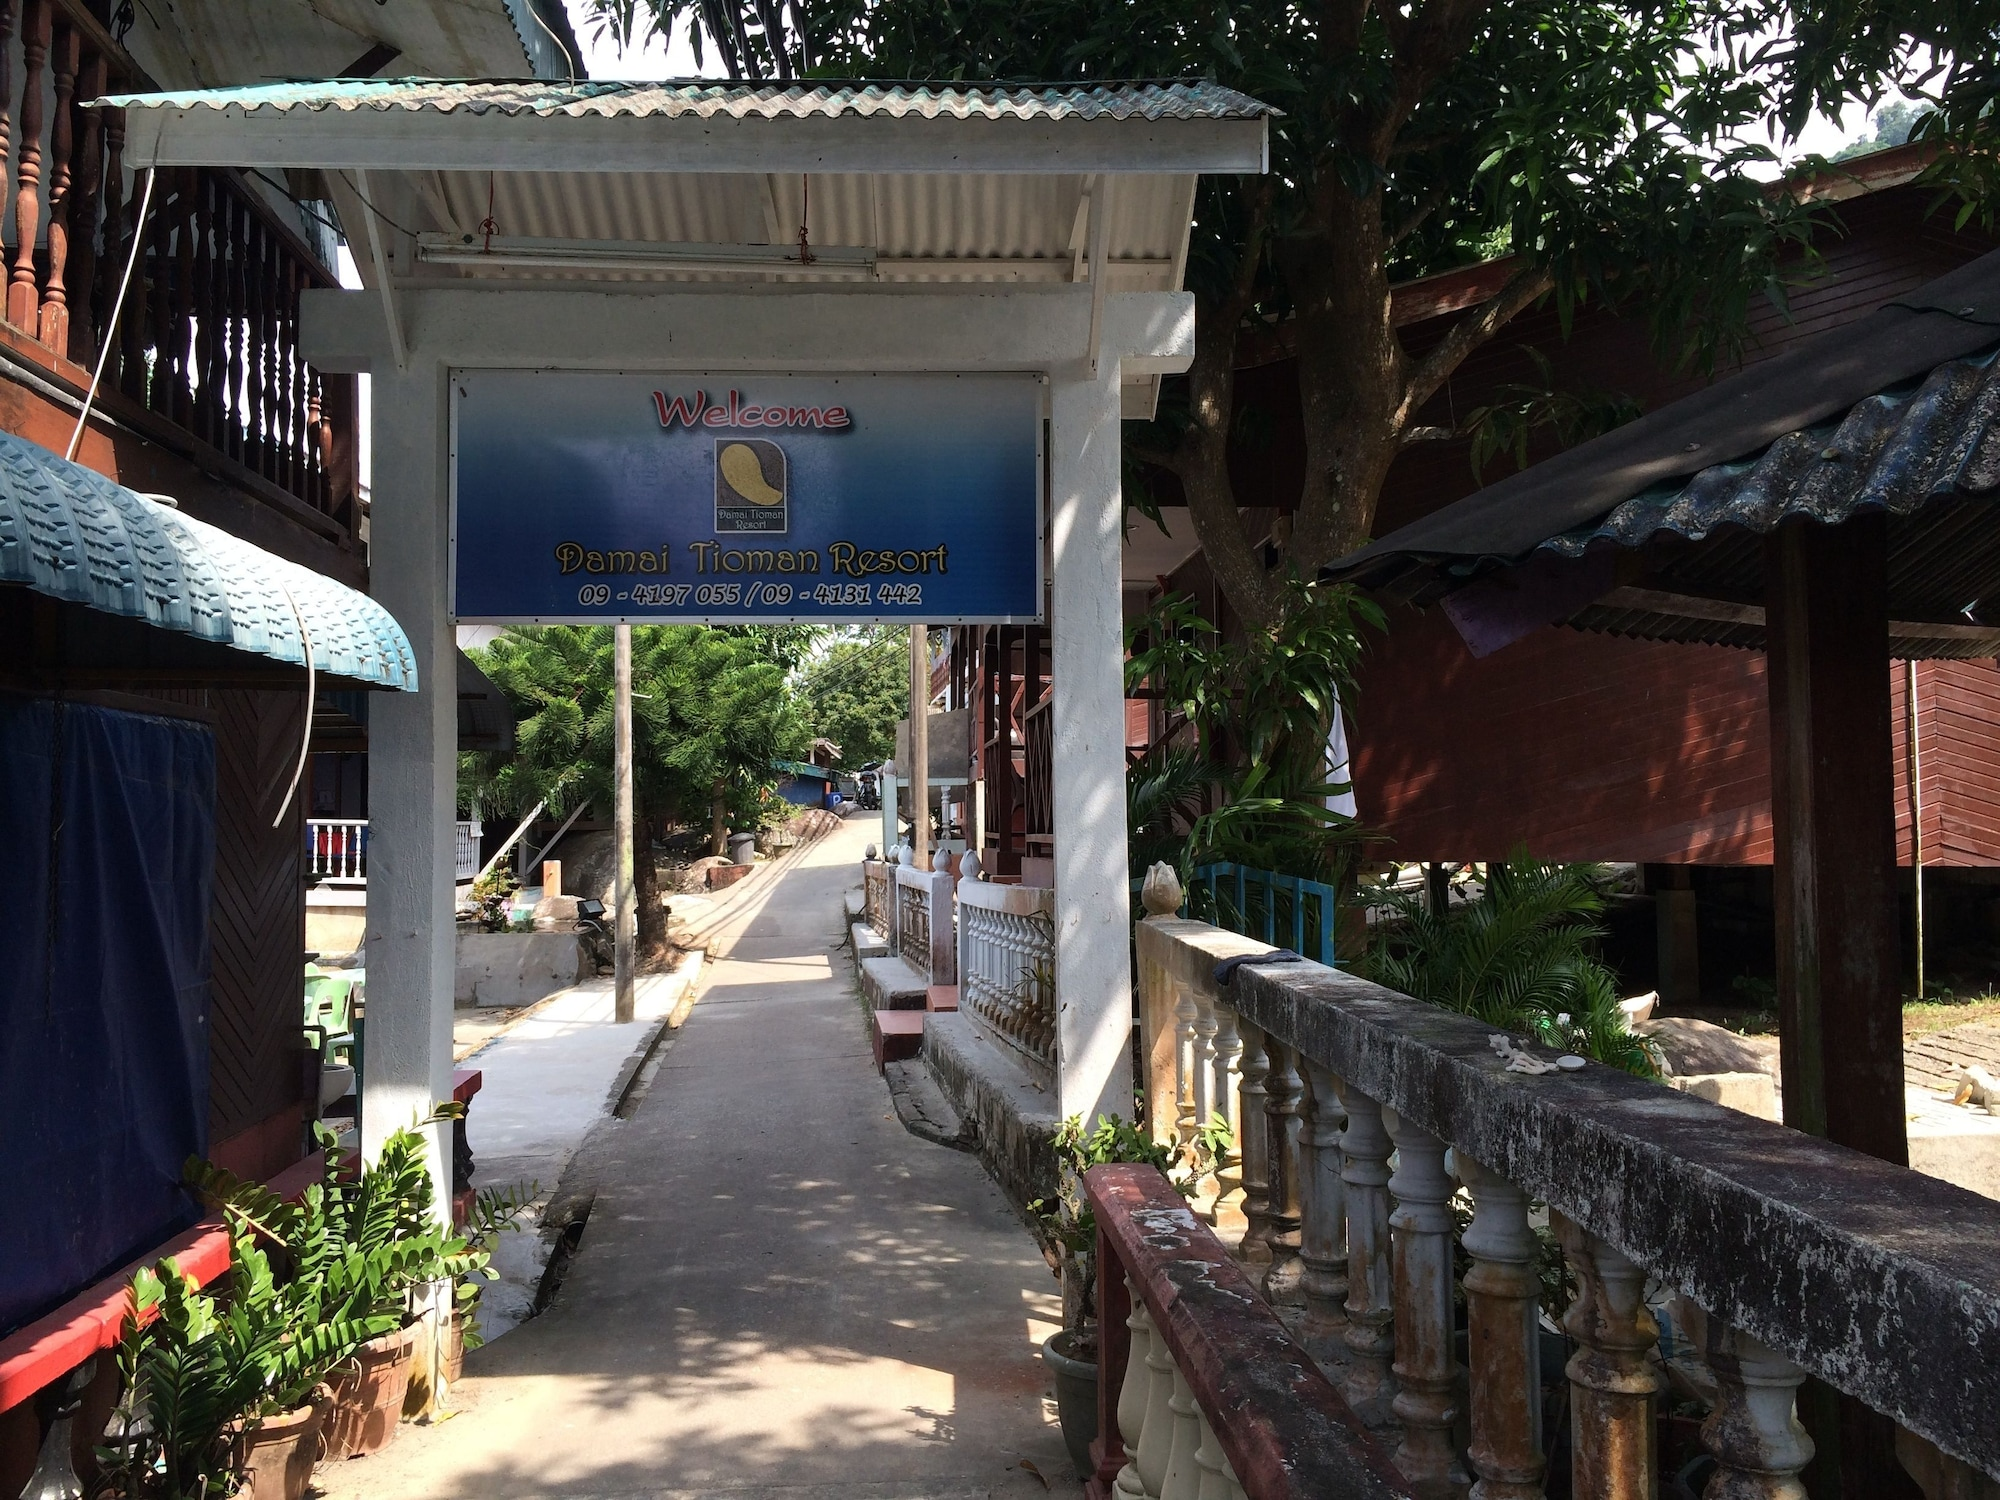 Damai Tioman Resort, Hulu Langat